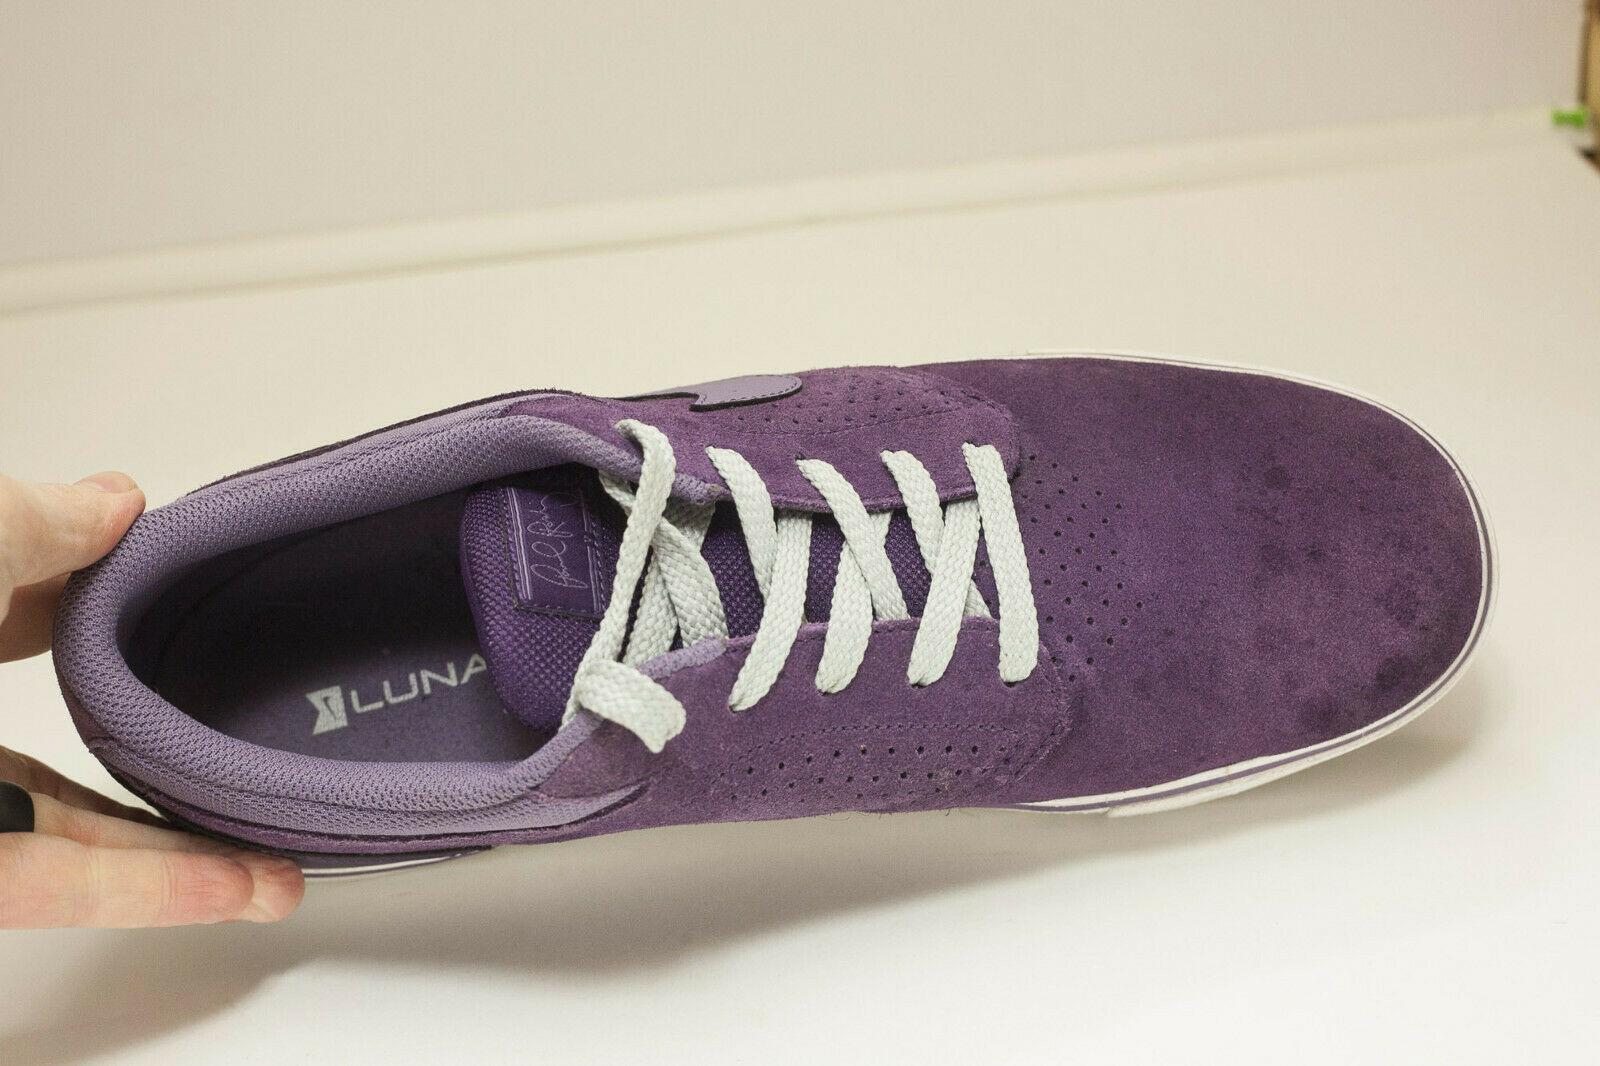 Nike Paul Rodriguez US 13 Purple Sneakers Men's Skate Shoes